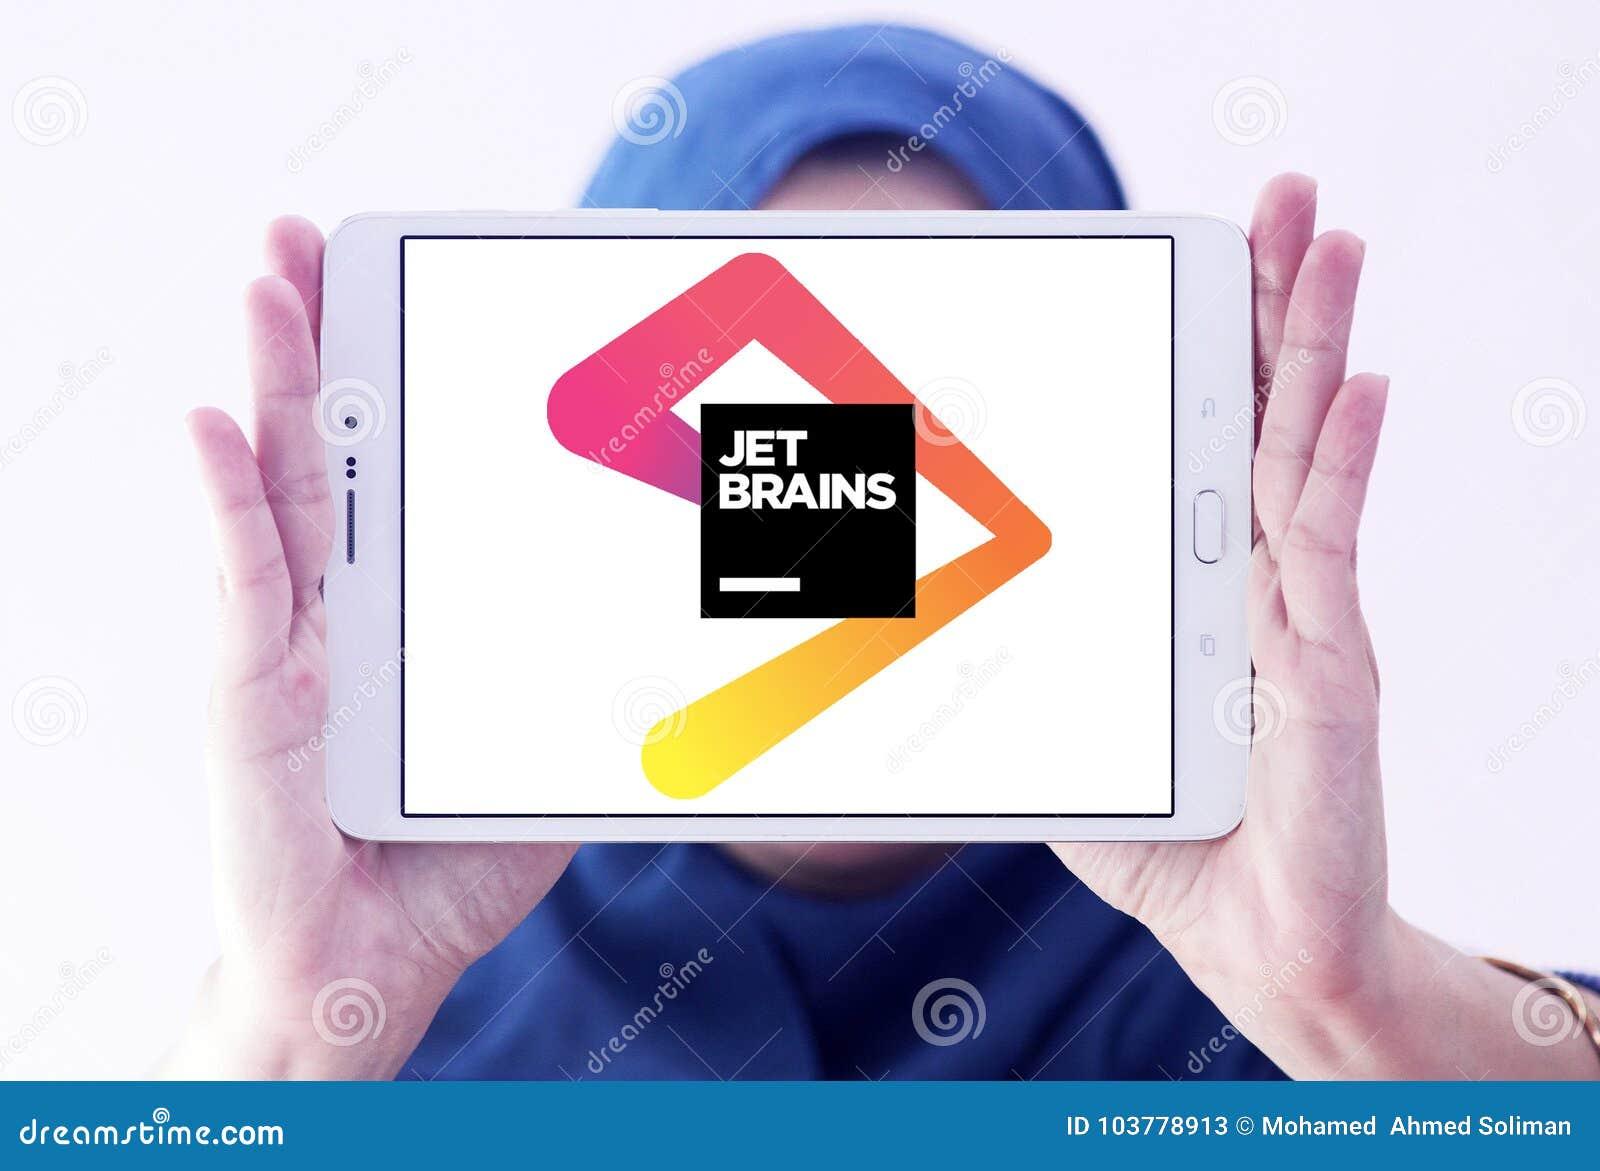 JetBrains Software Development Company Logo Editorial Stock Photo